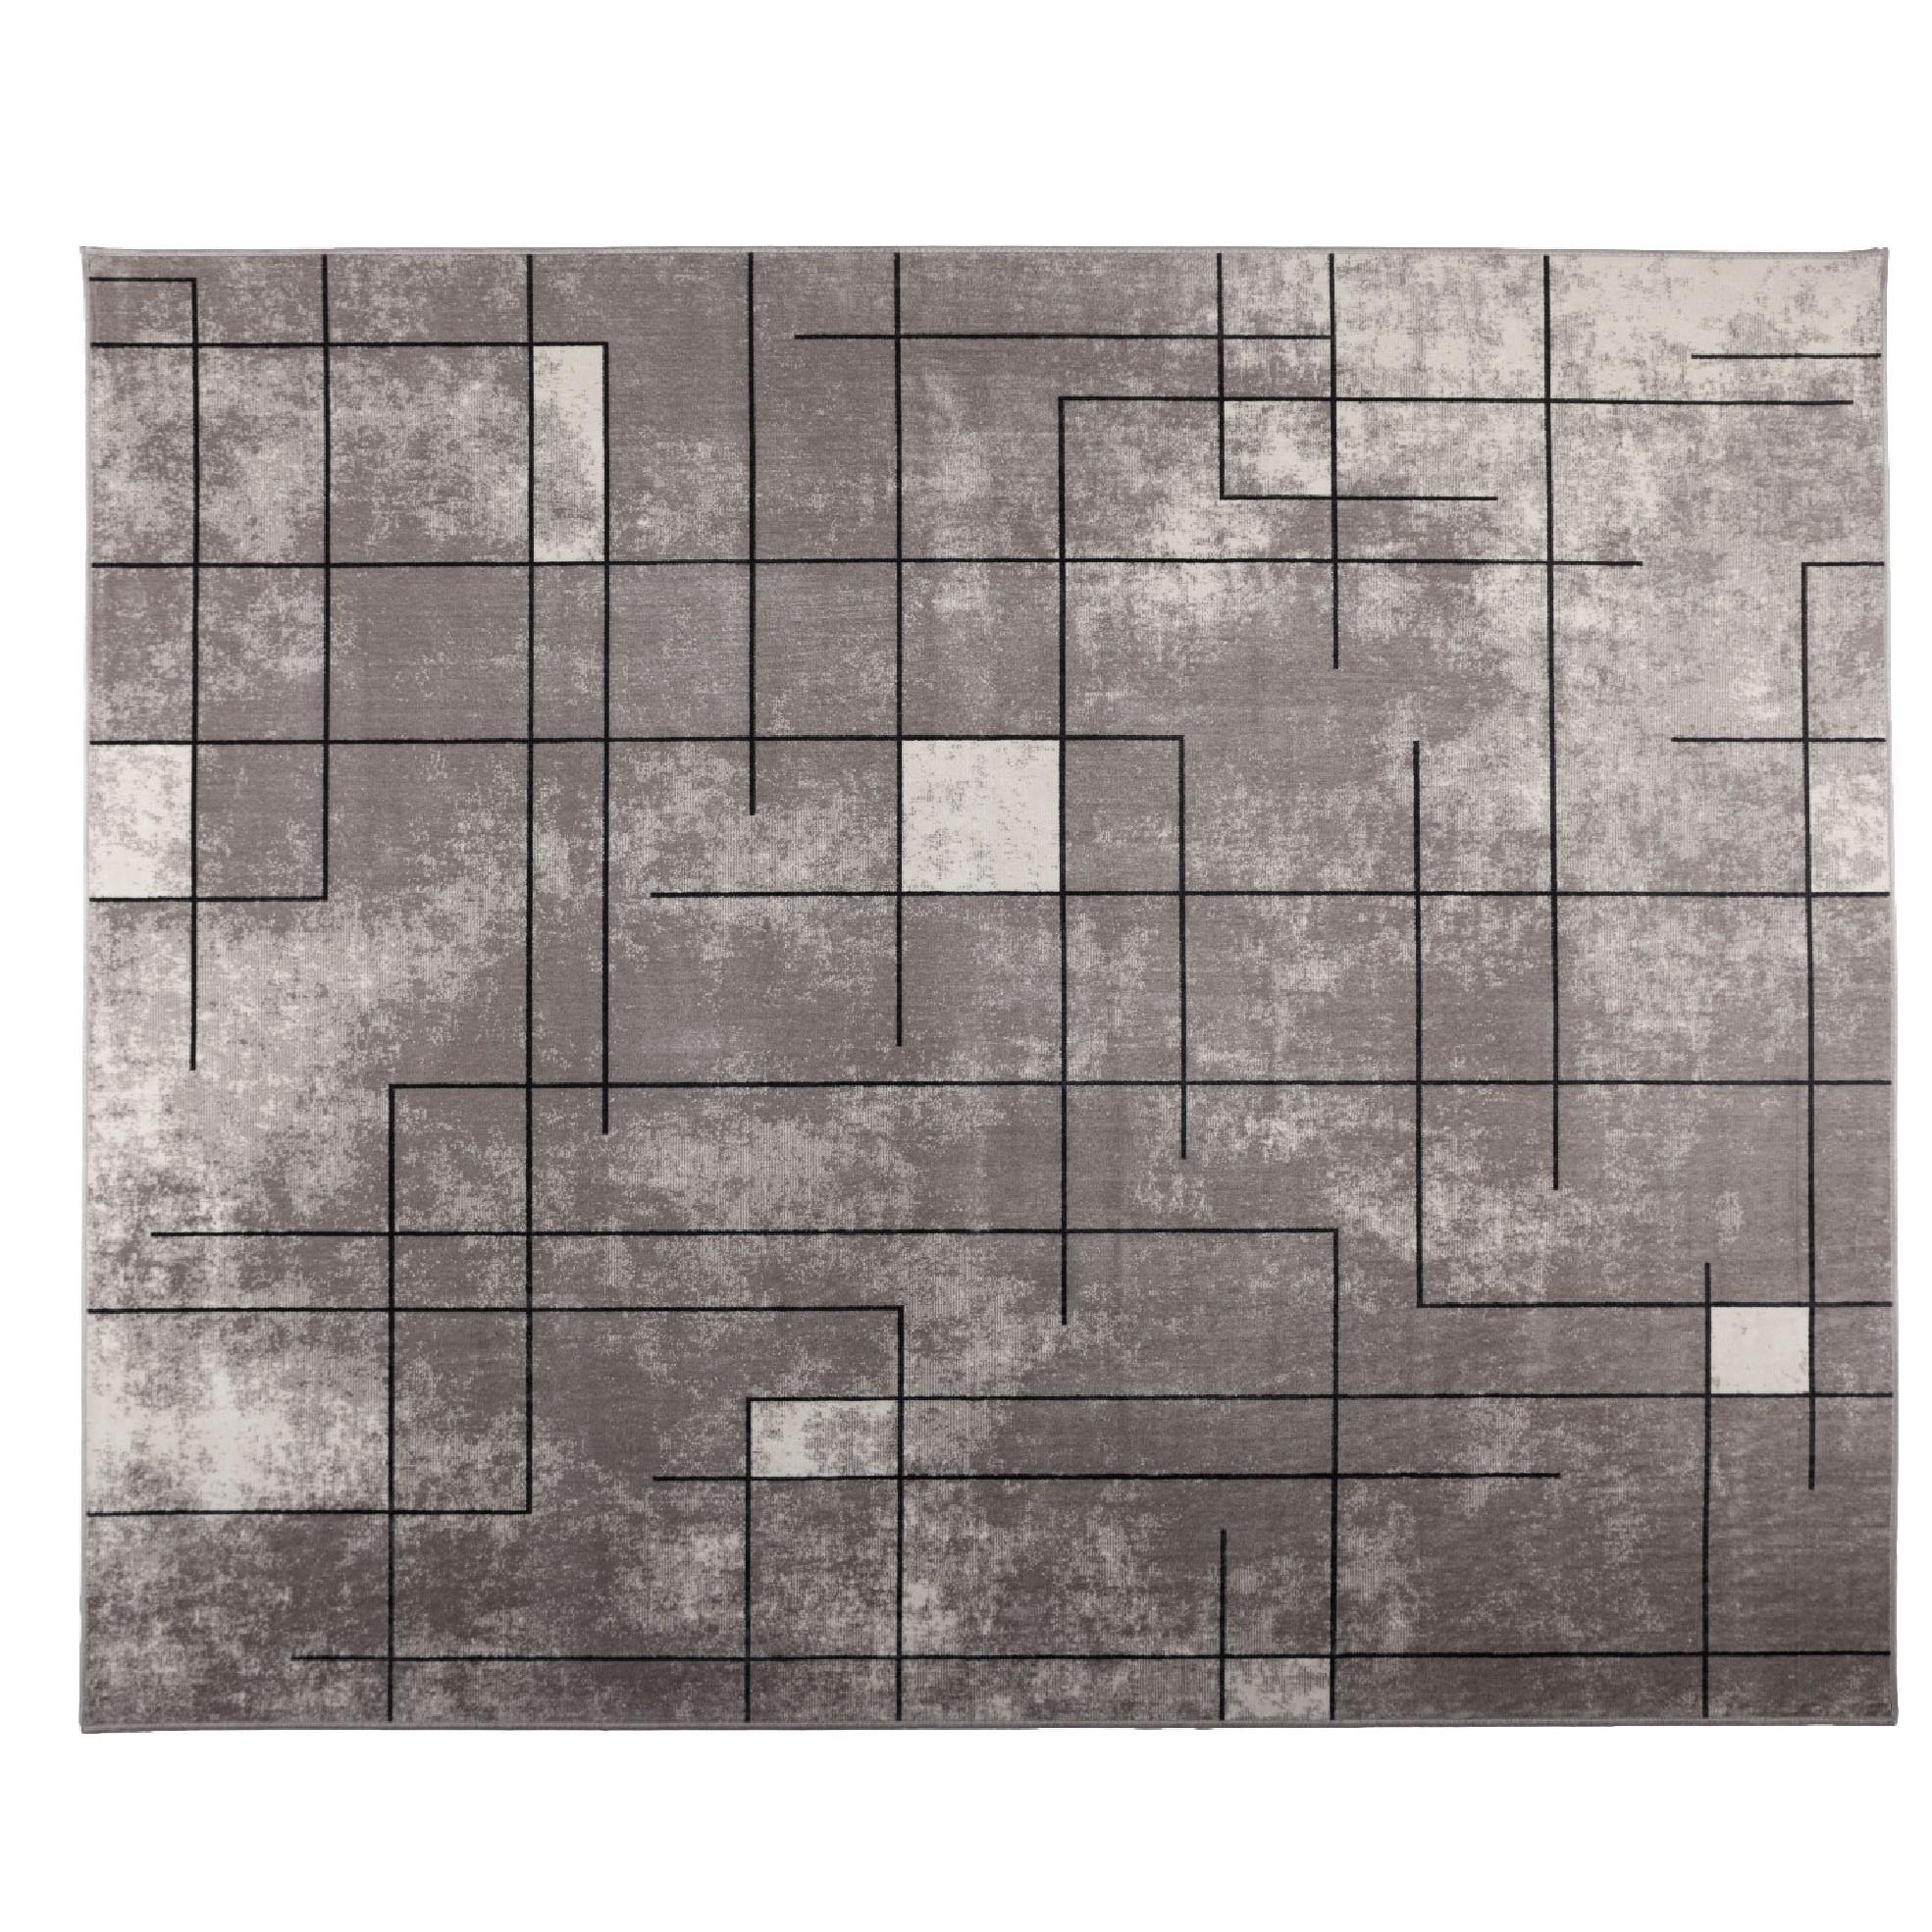 Tapete de Tecido Retangular 200x250cm Belga - Fatex